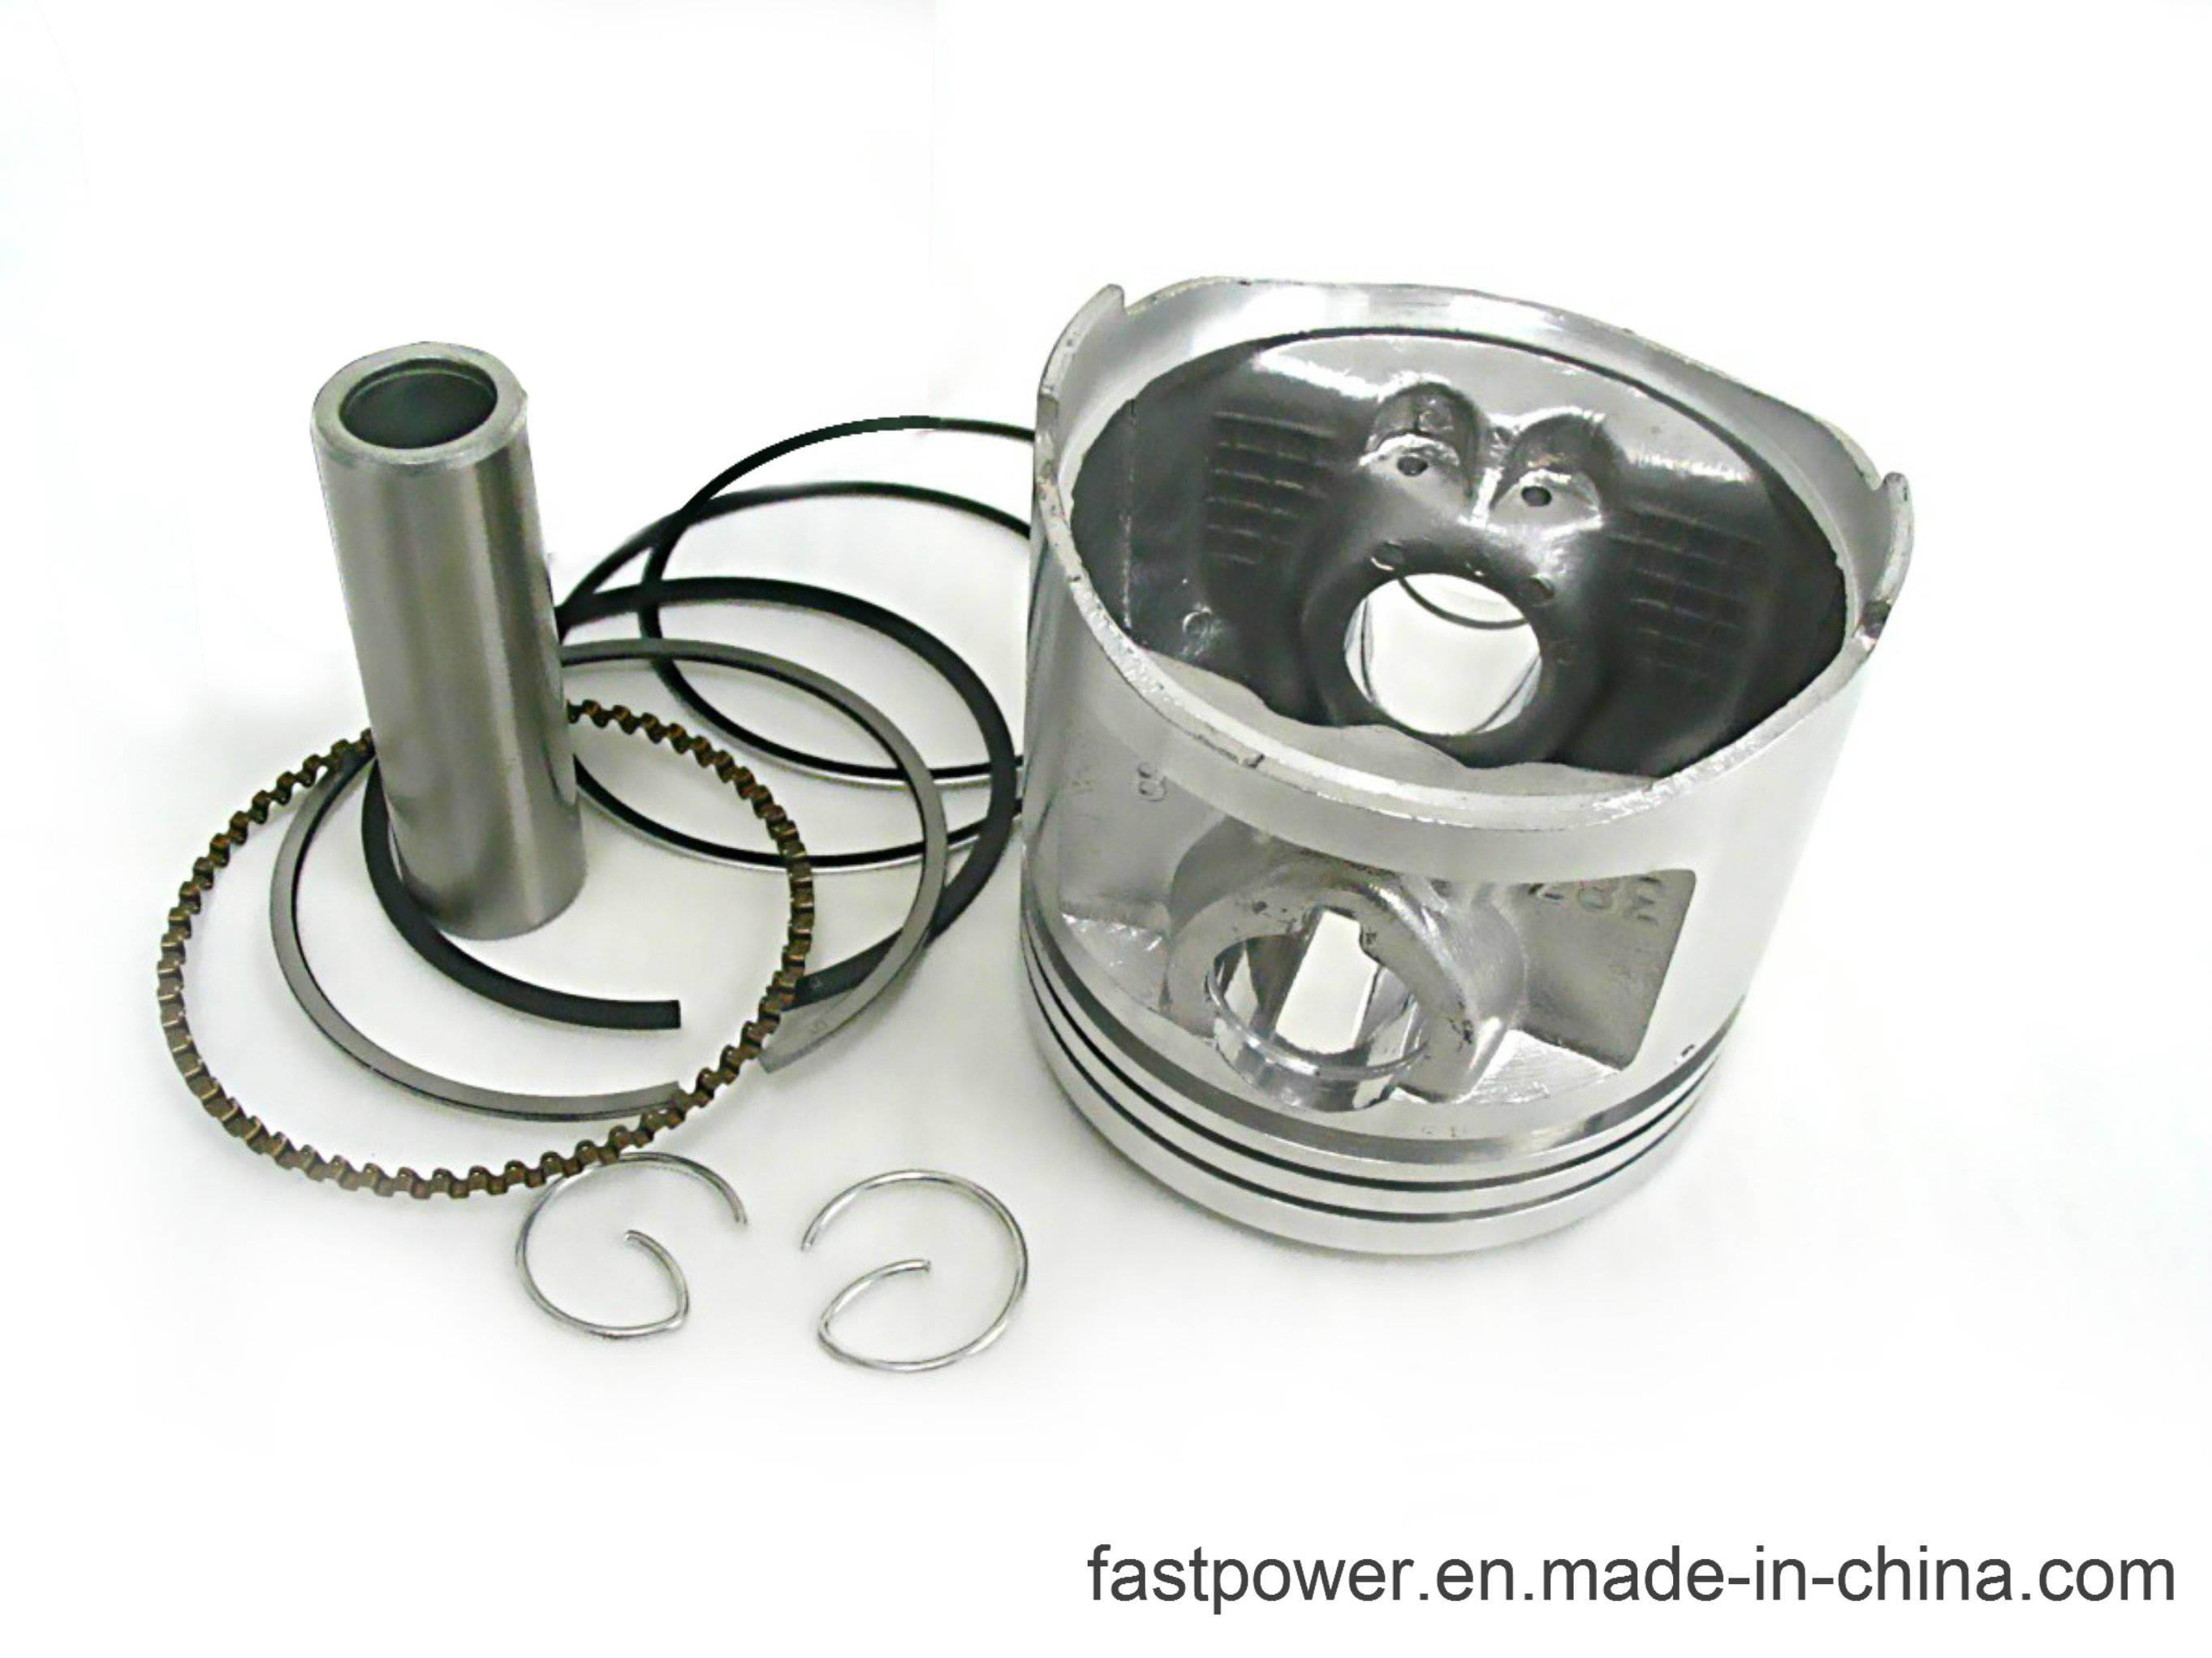 Hot Sale Diesel Engine Spare Parts Piston Kit Set